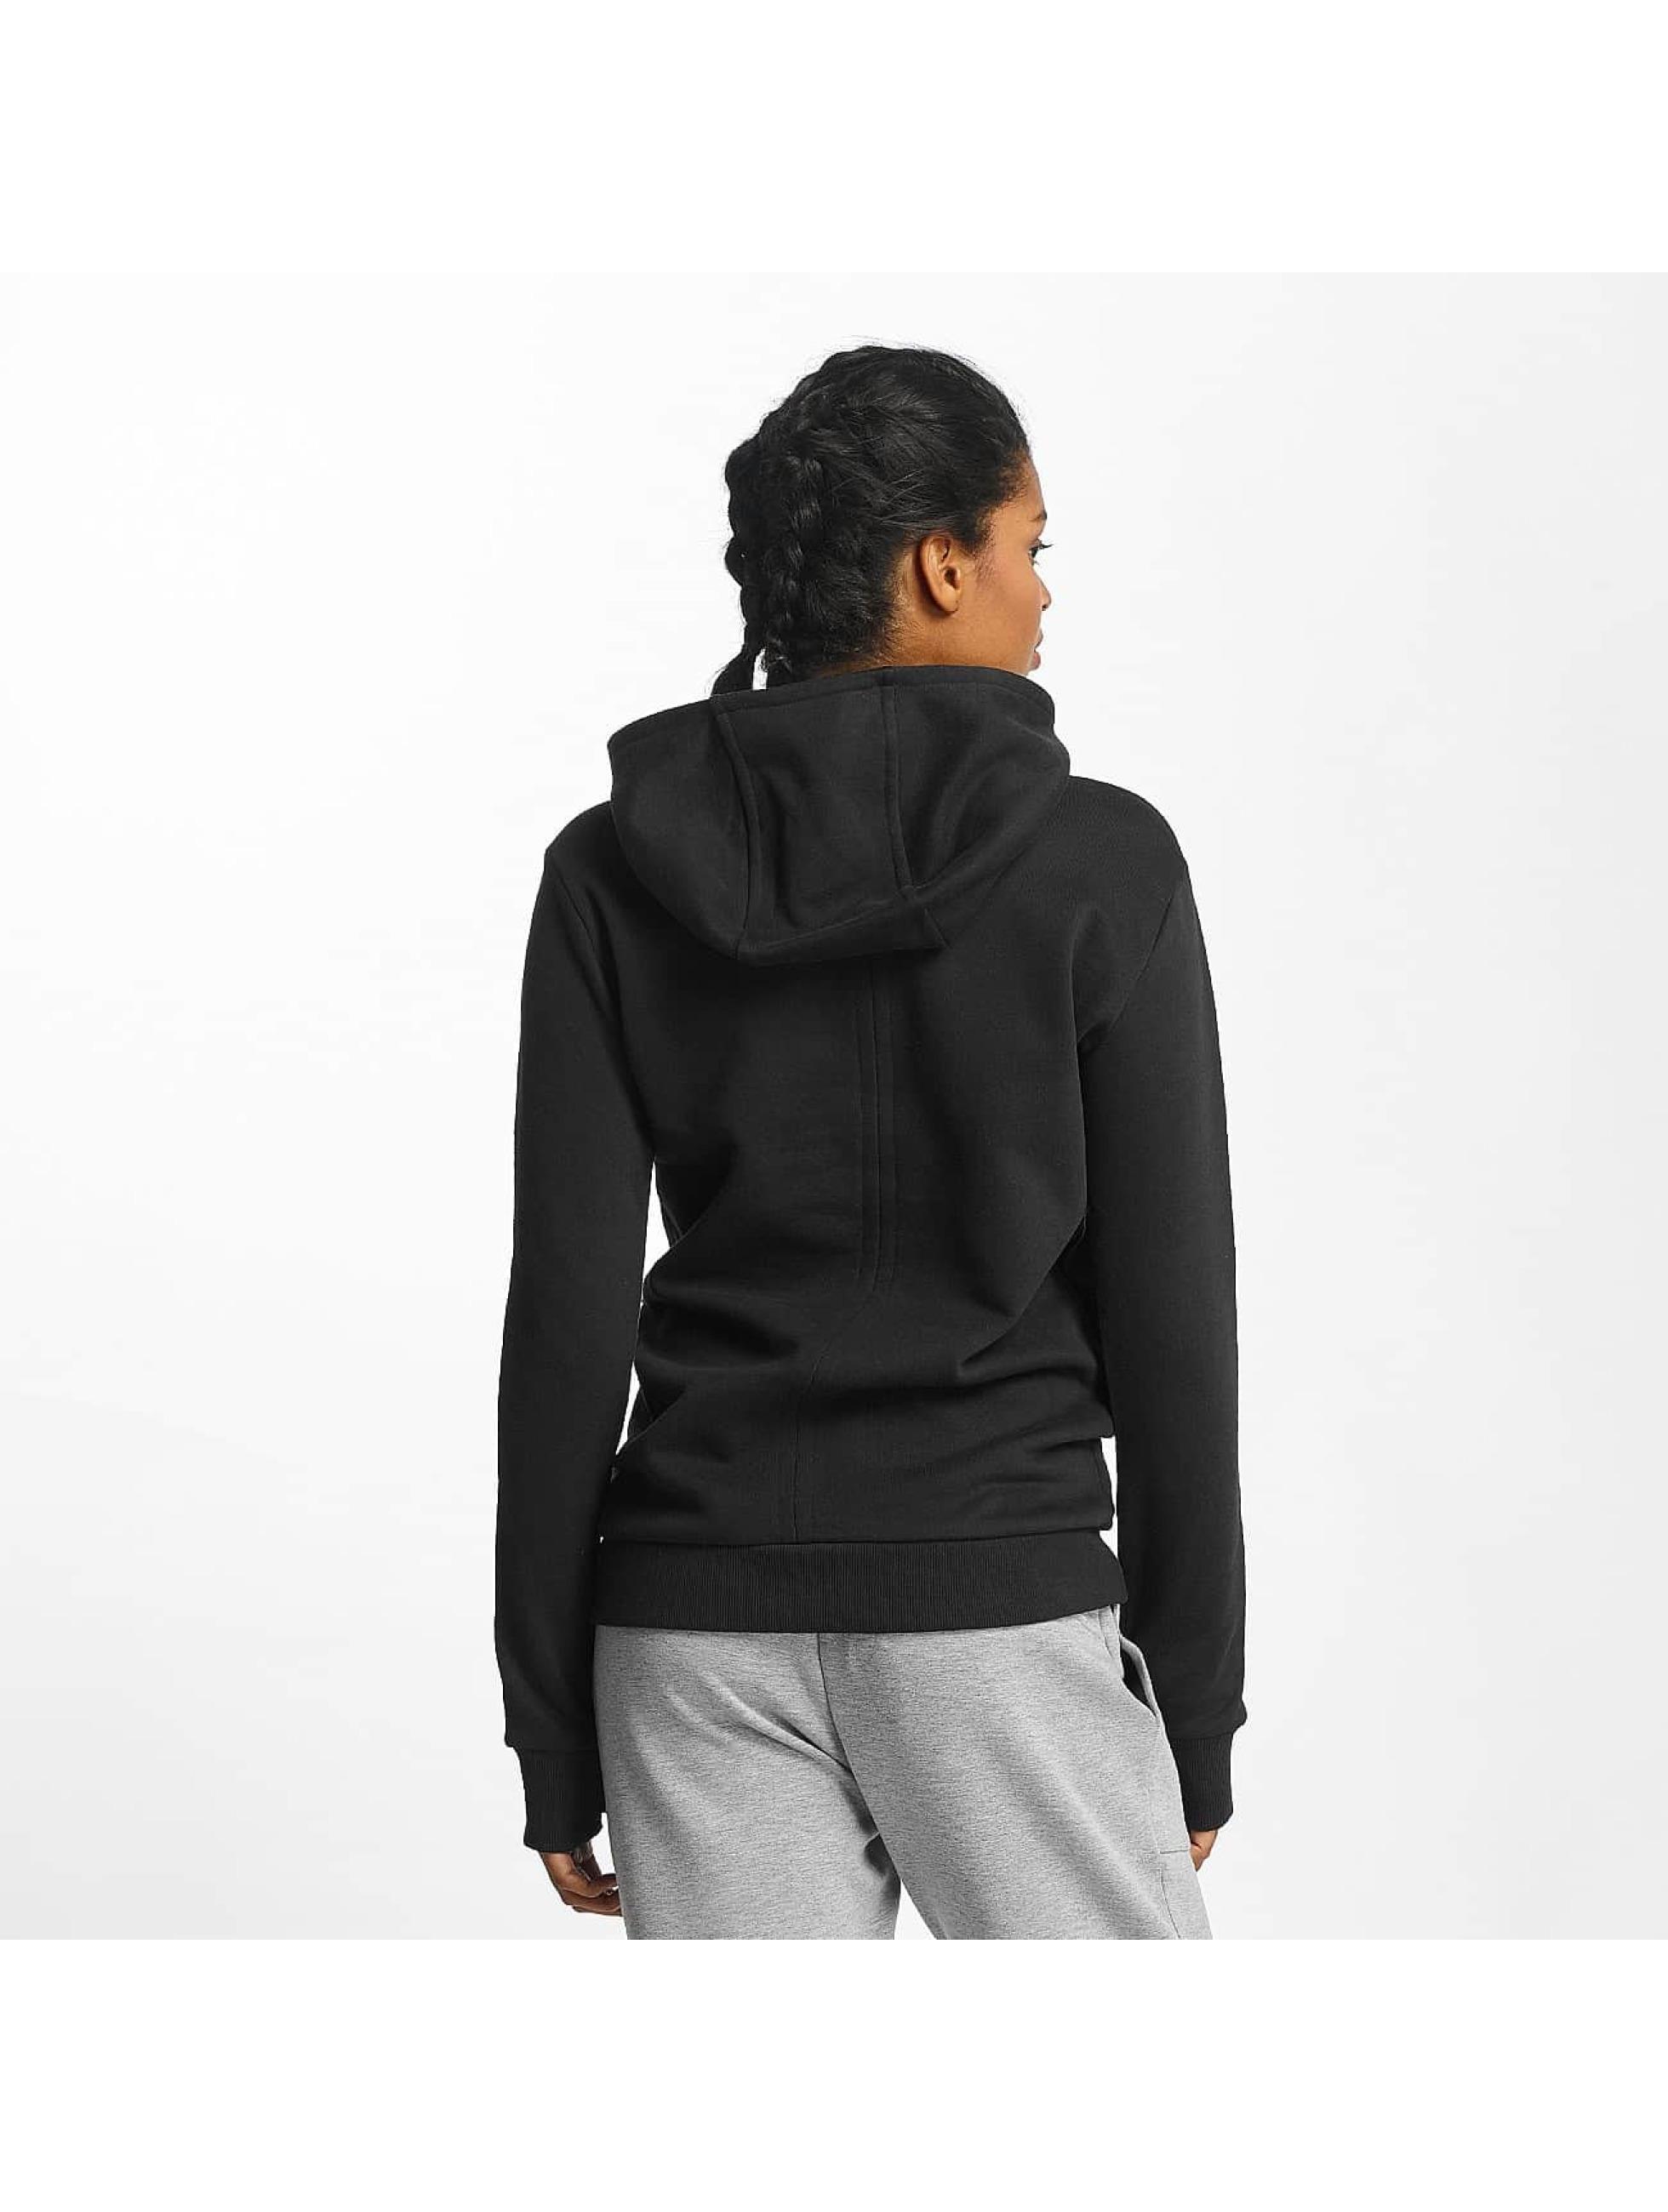 Bench Hoodies Crop Print čern